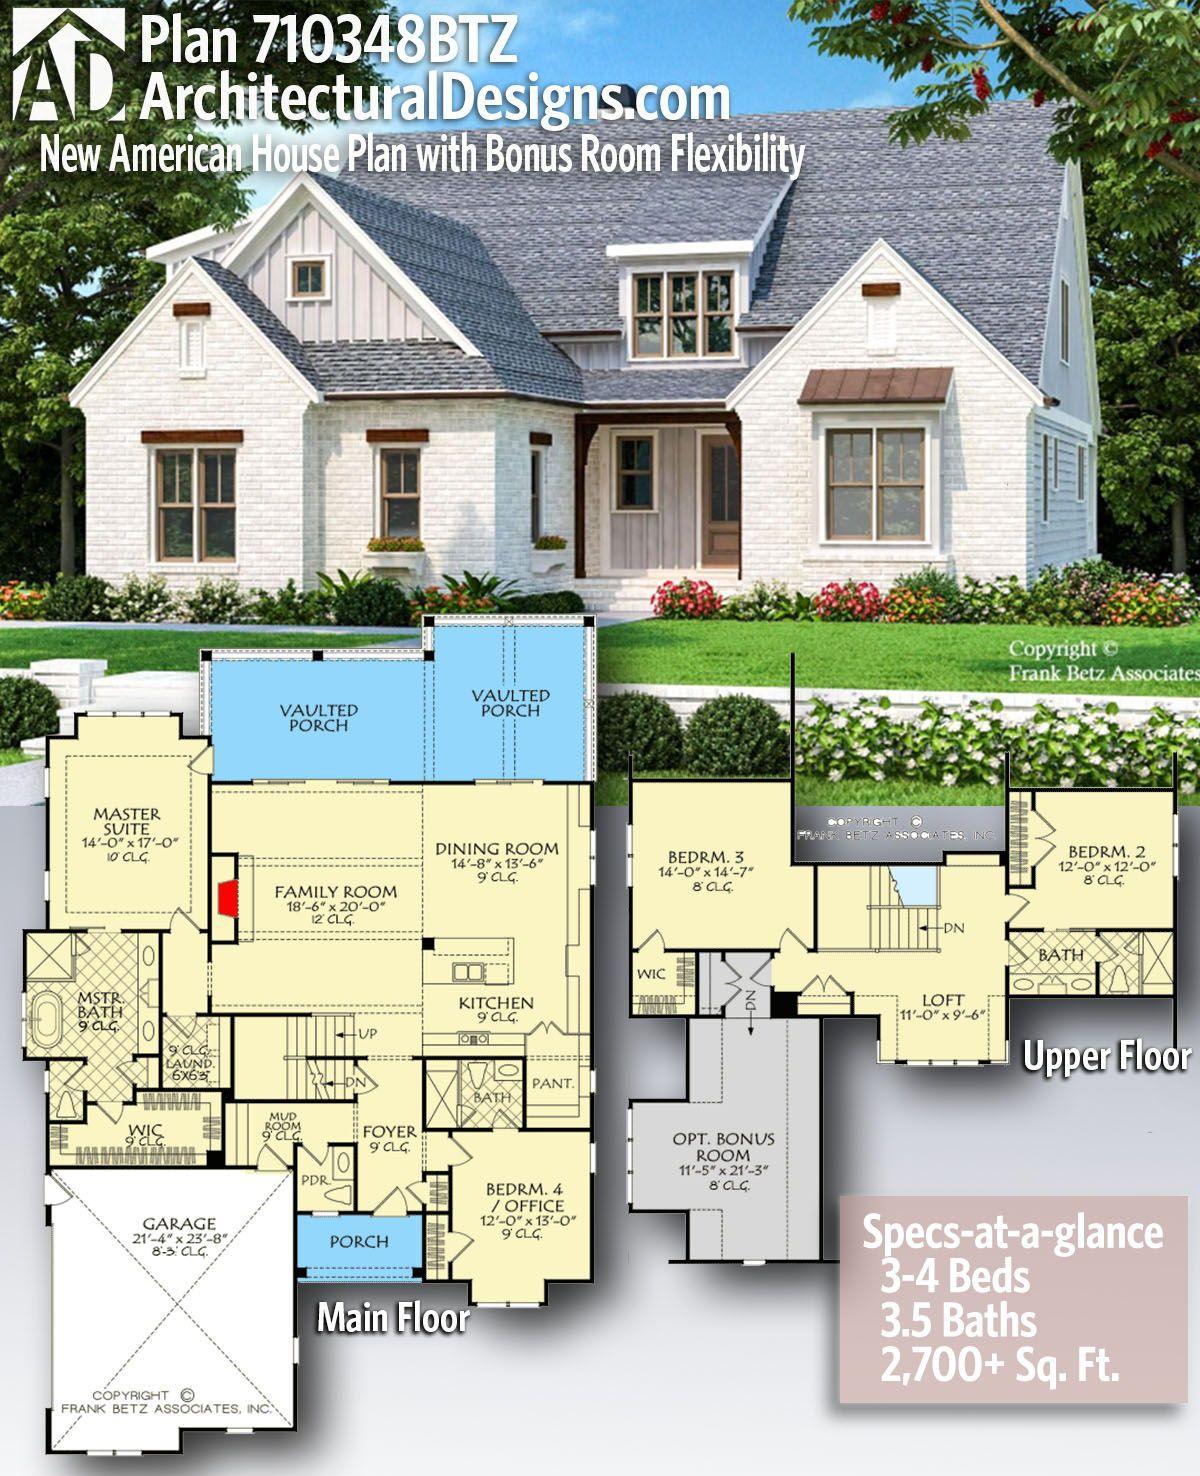 Plan 710348btz New American House Plan With Bonus Room Flexibility In 2020 House Plans American Houses New House Plans